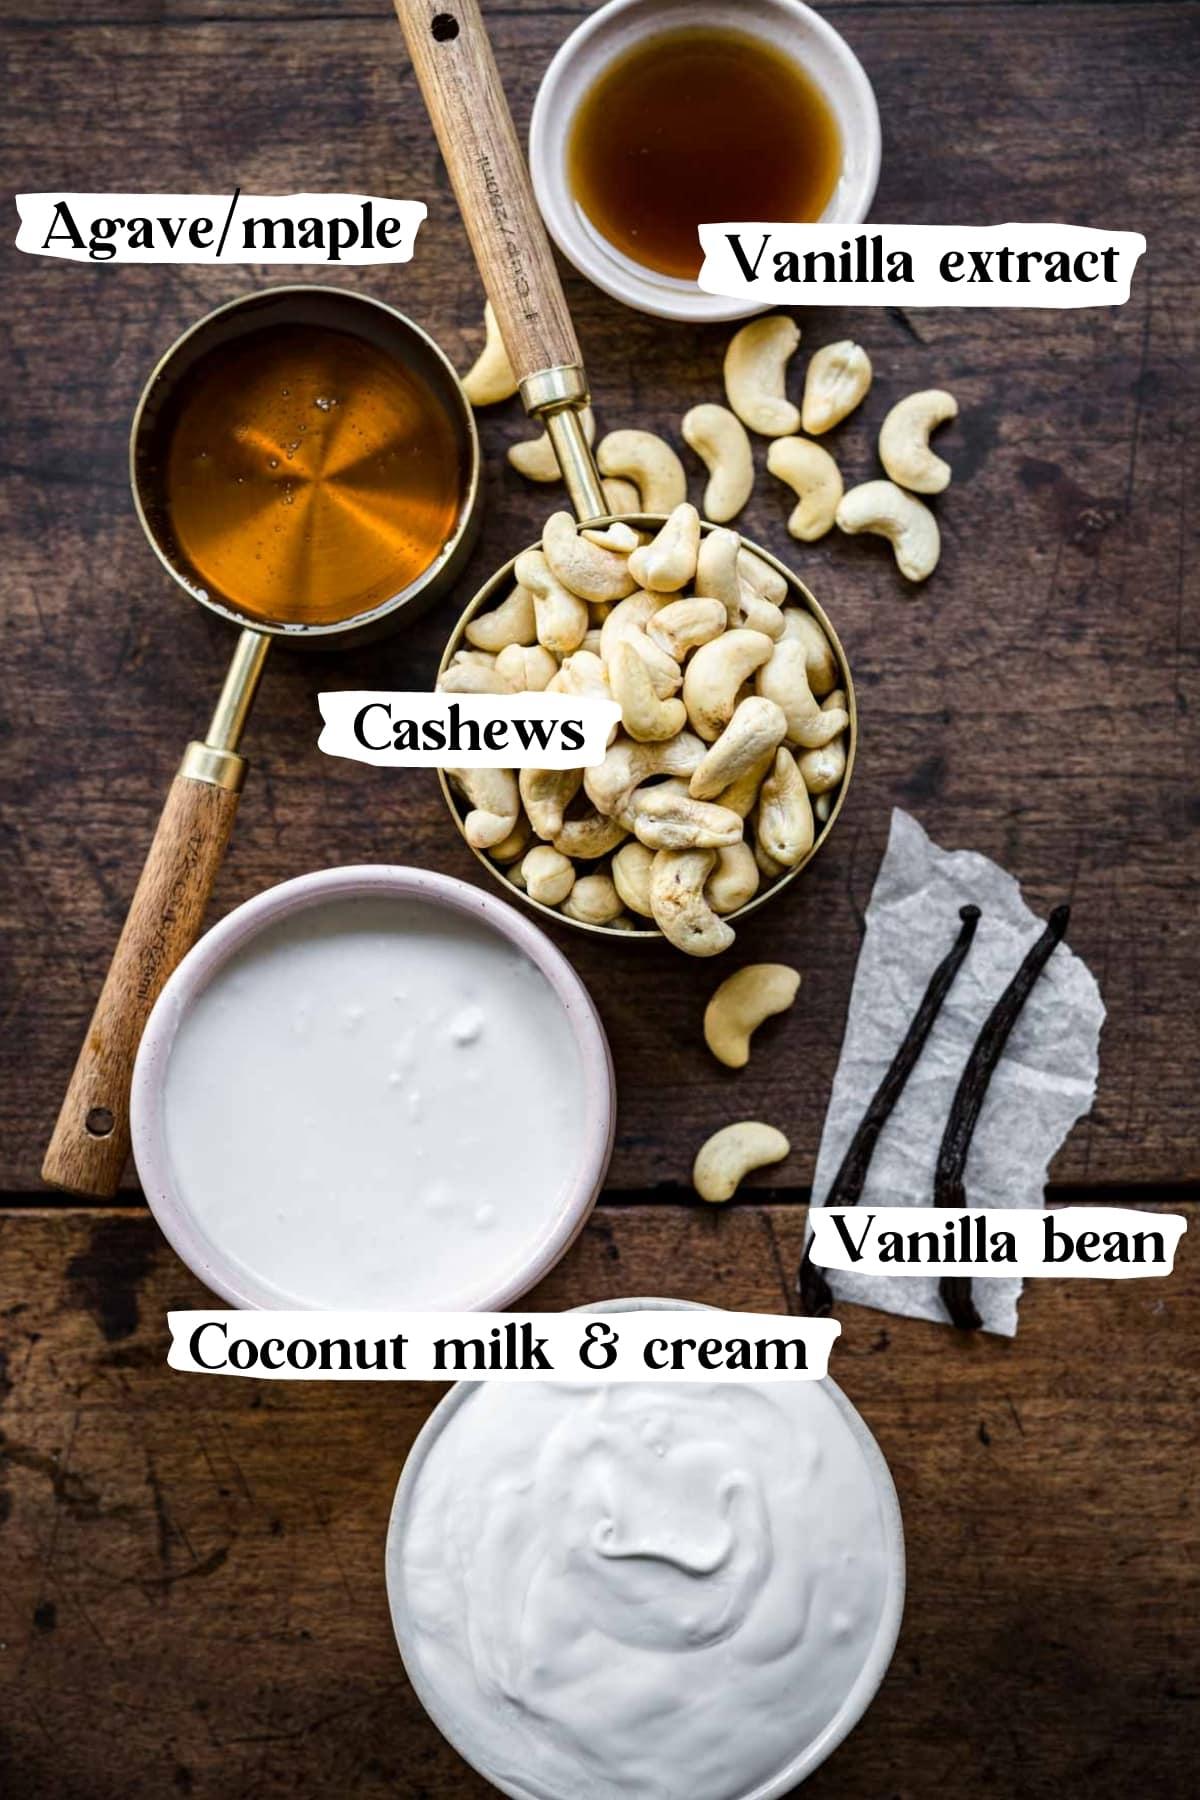 overhead view of ingredients for no churn vegan vanilla ice cream.